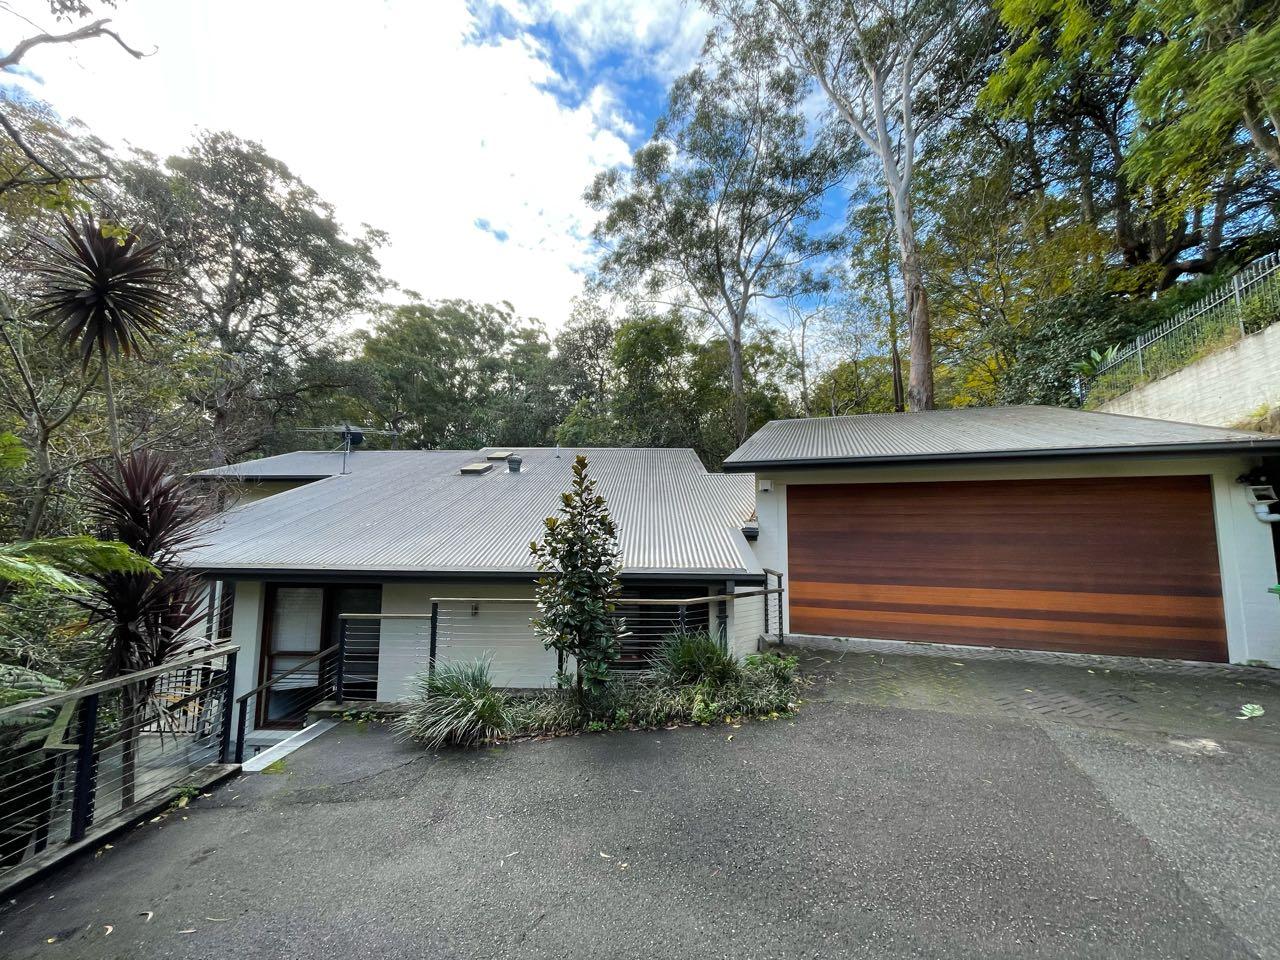 47A Bent St, Lindfield NSW 2070, Australia